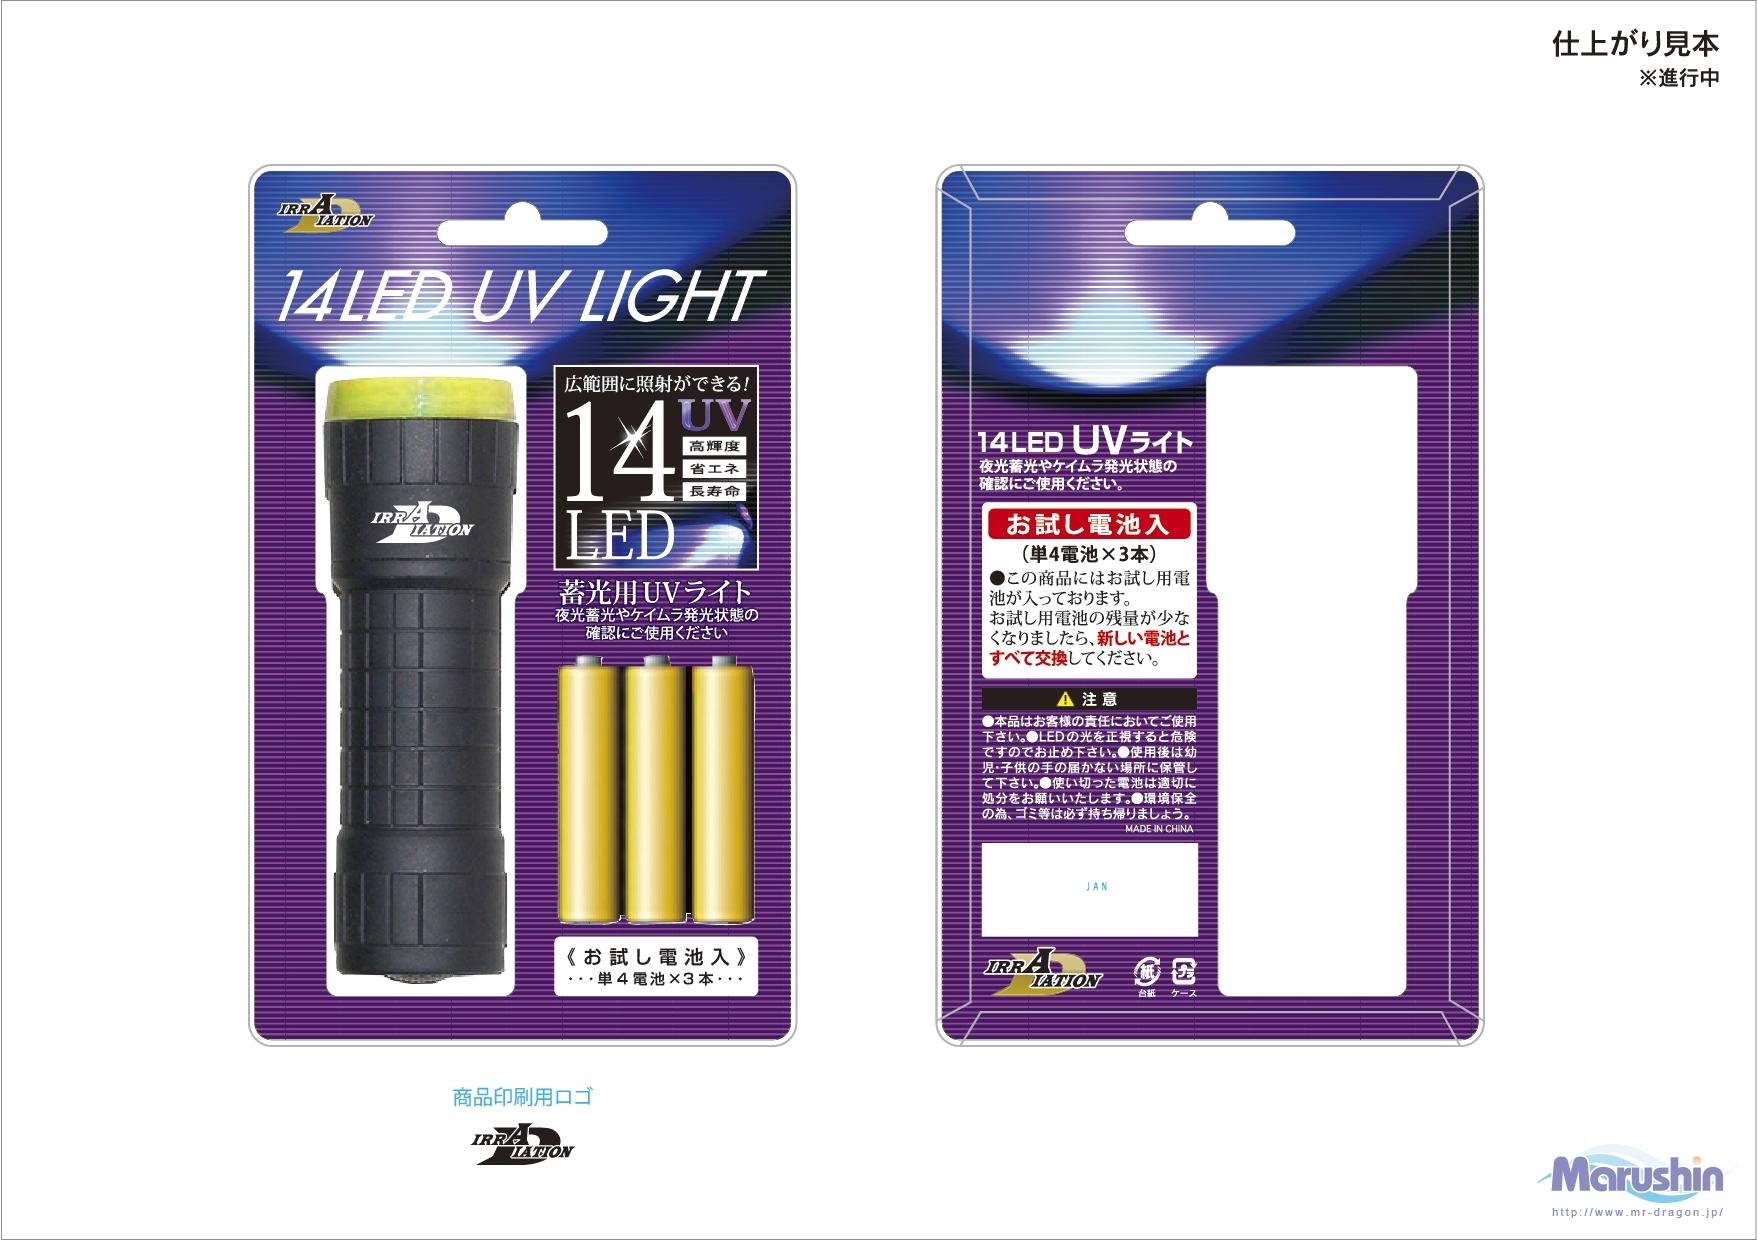 14LED UVライトイメージ画像